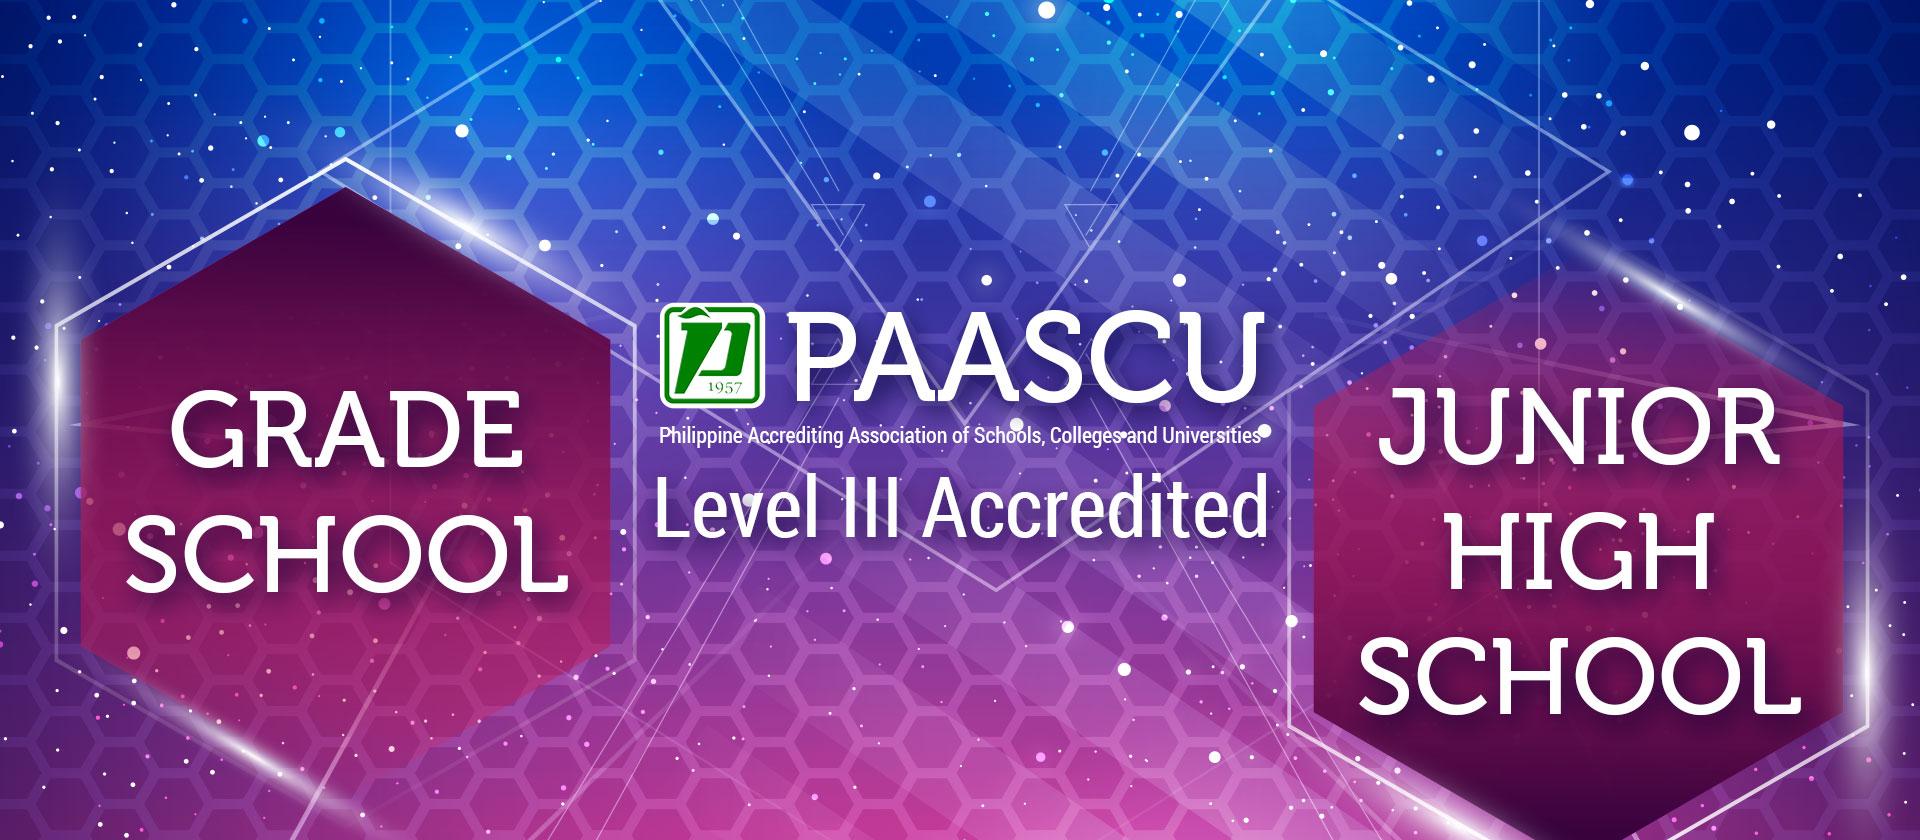 PAASCU Level III Accredited – Grade School and Junior High School